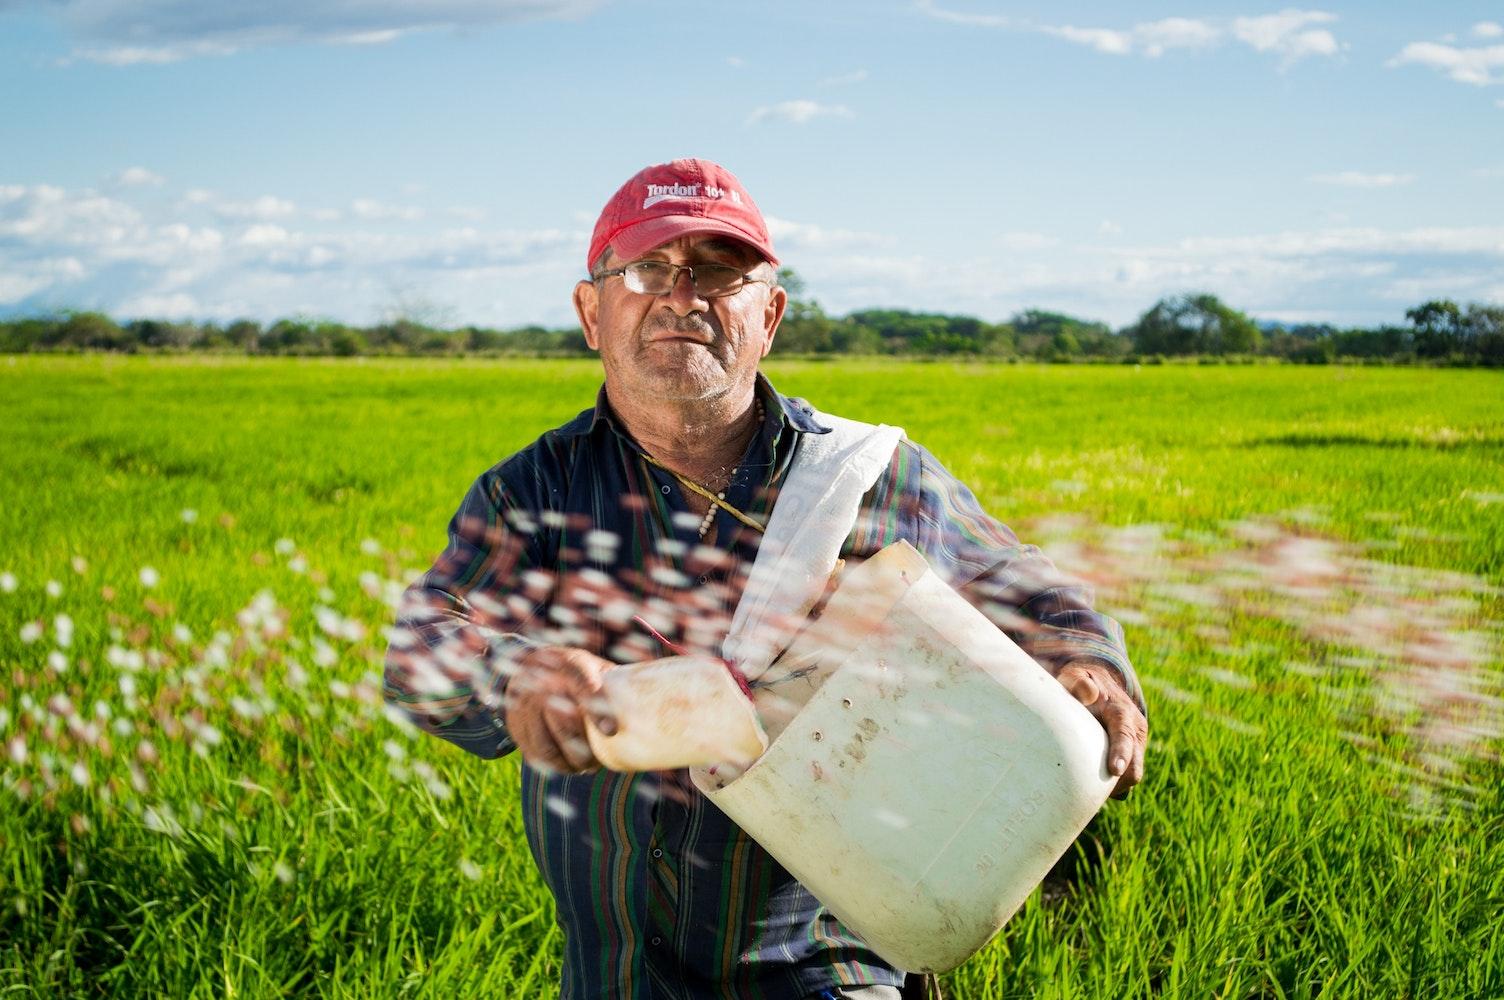 Free Stock Photos Of Farmer 183 Pexels